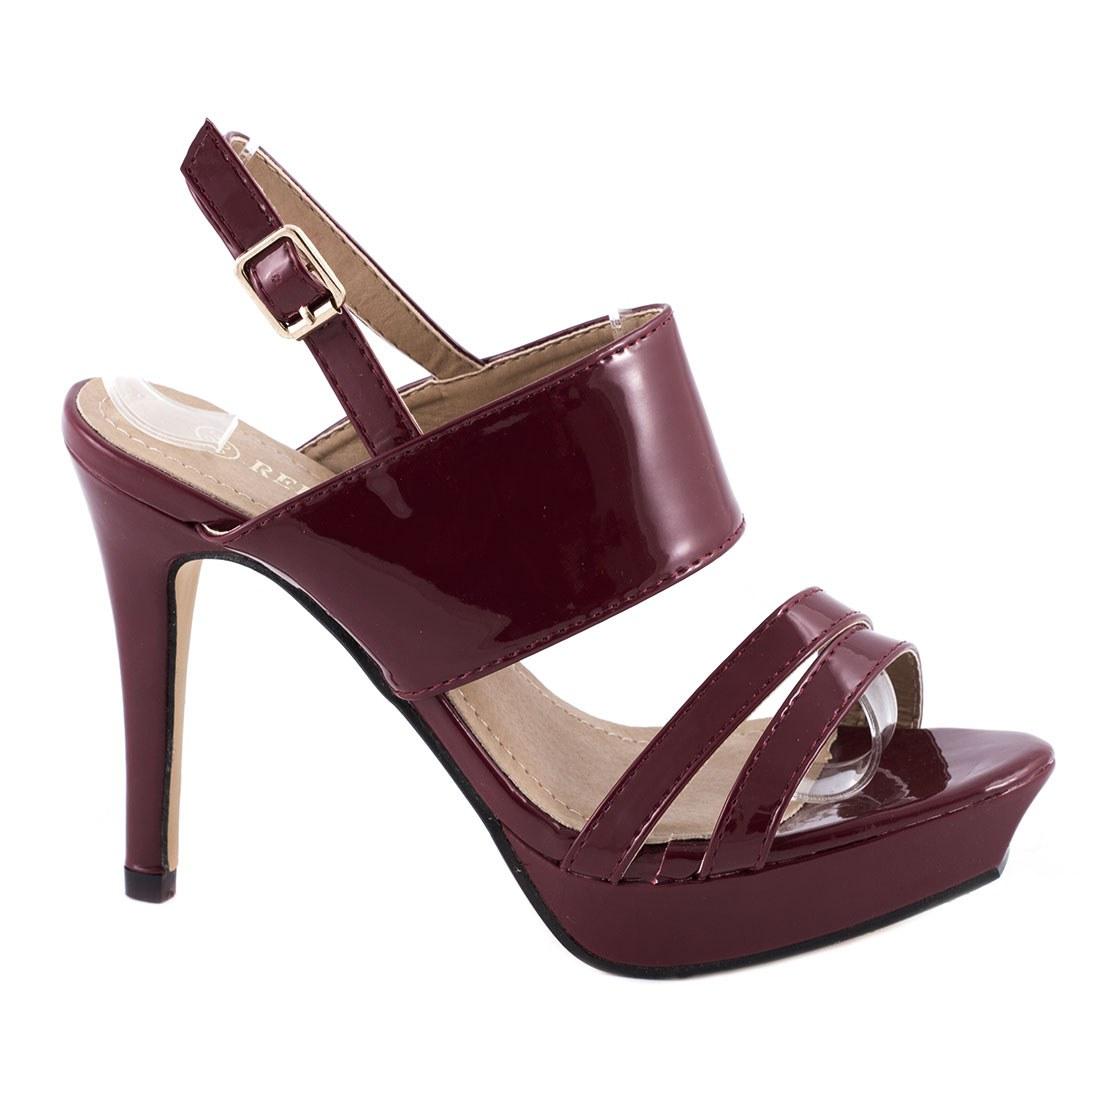 Sandale de dama comode 82975-BURGUNDY